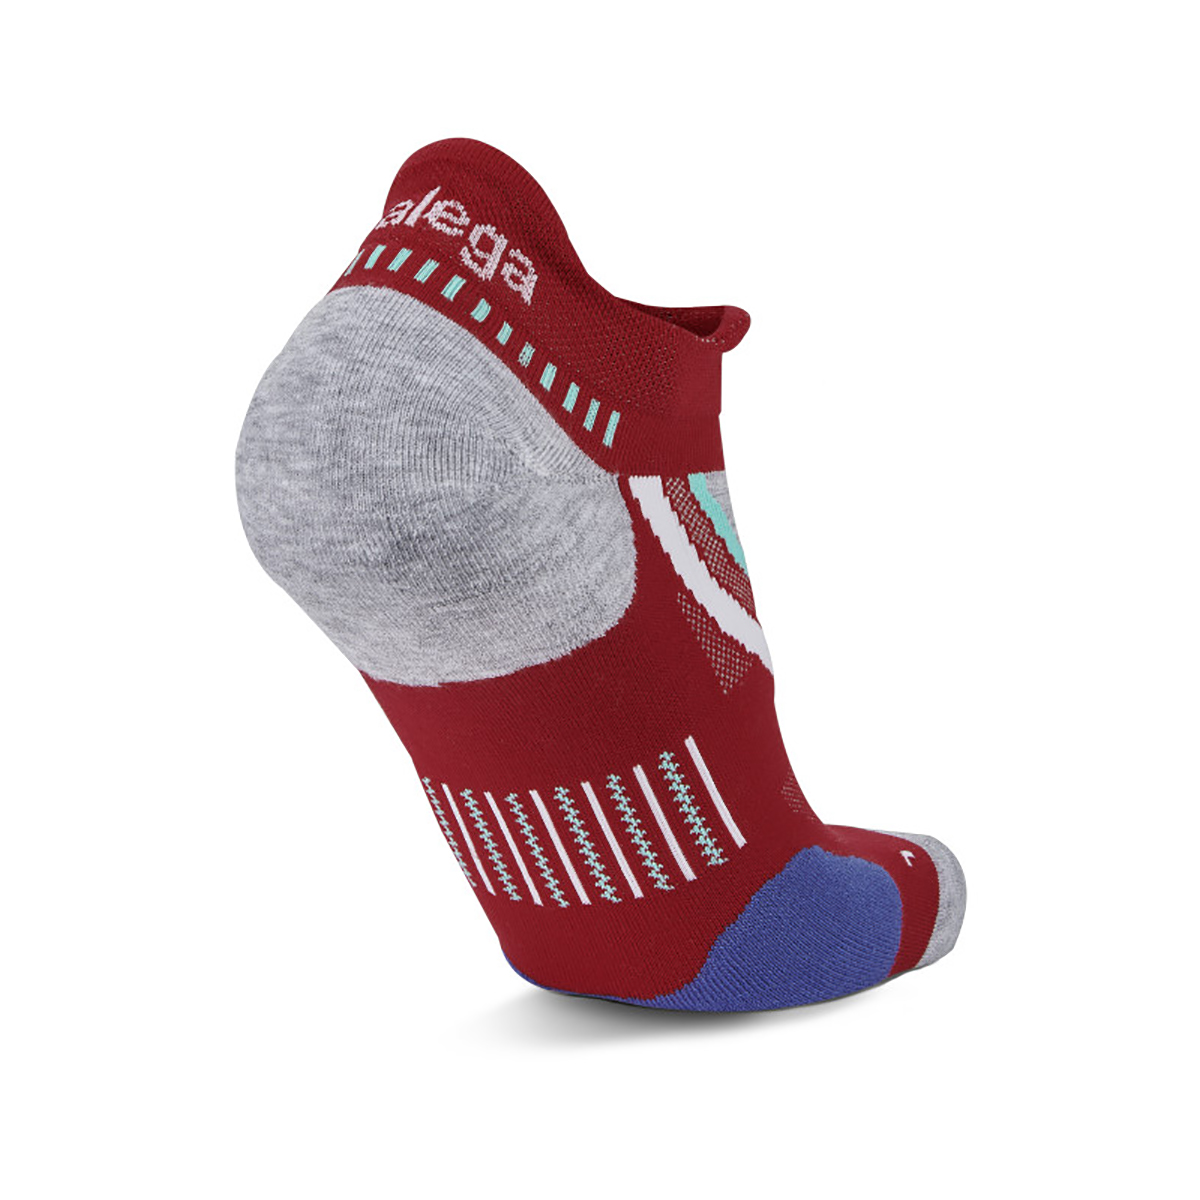 Balega UltraGlide Running Socks - Color: Bright Red/ Midgrey - Size: S, Bright Red/ Midgrey, large, image 3